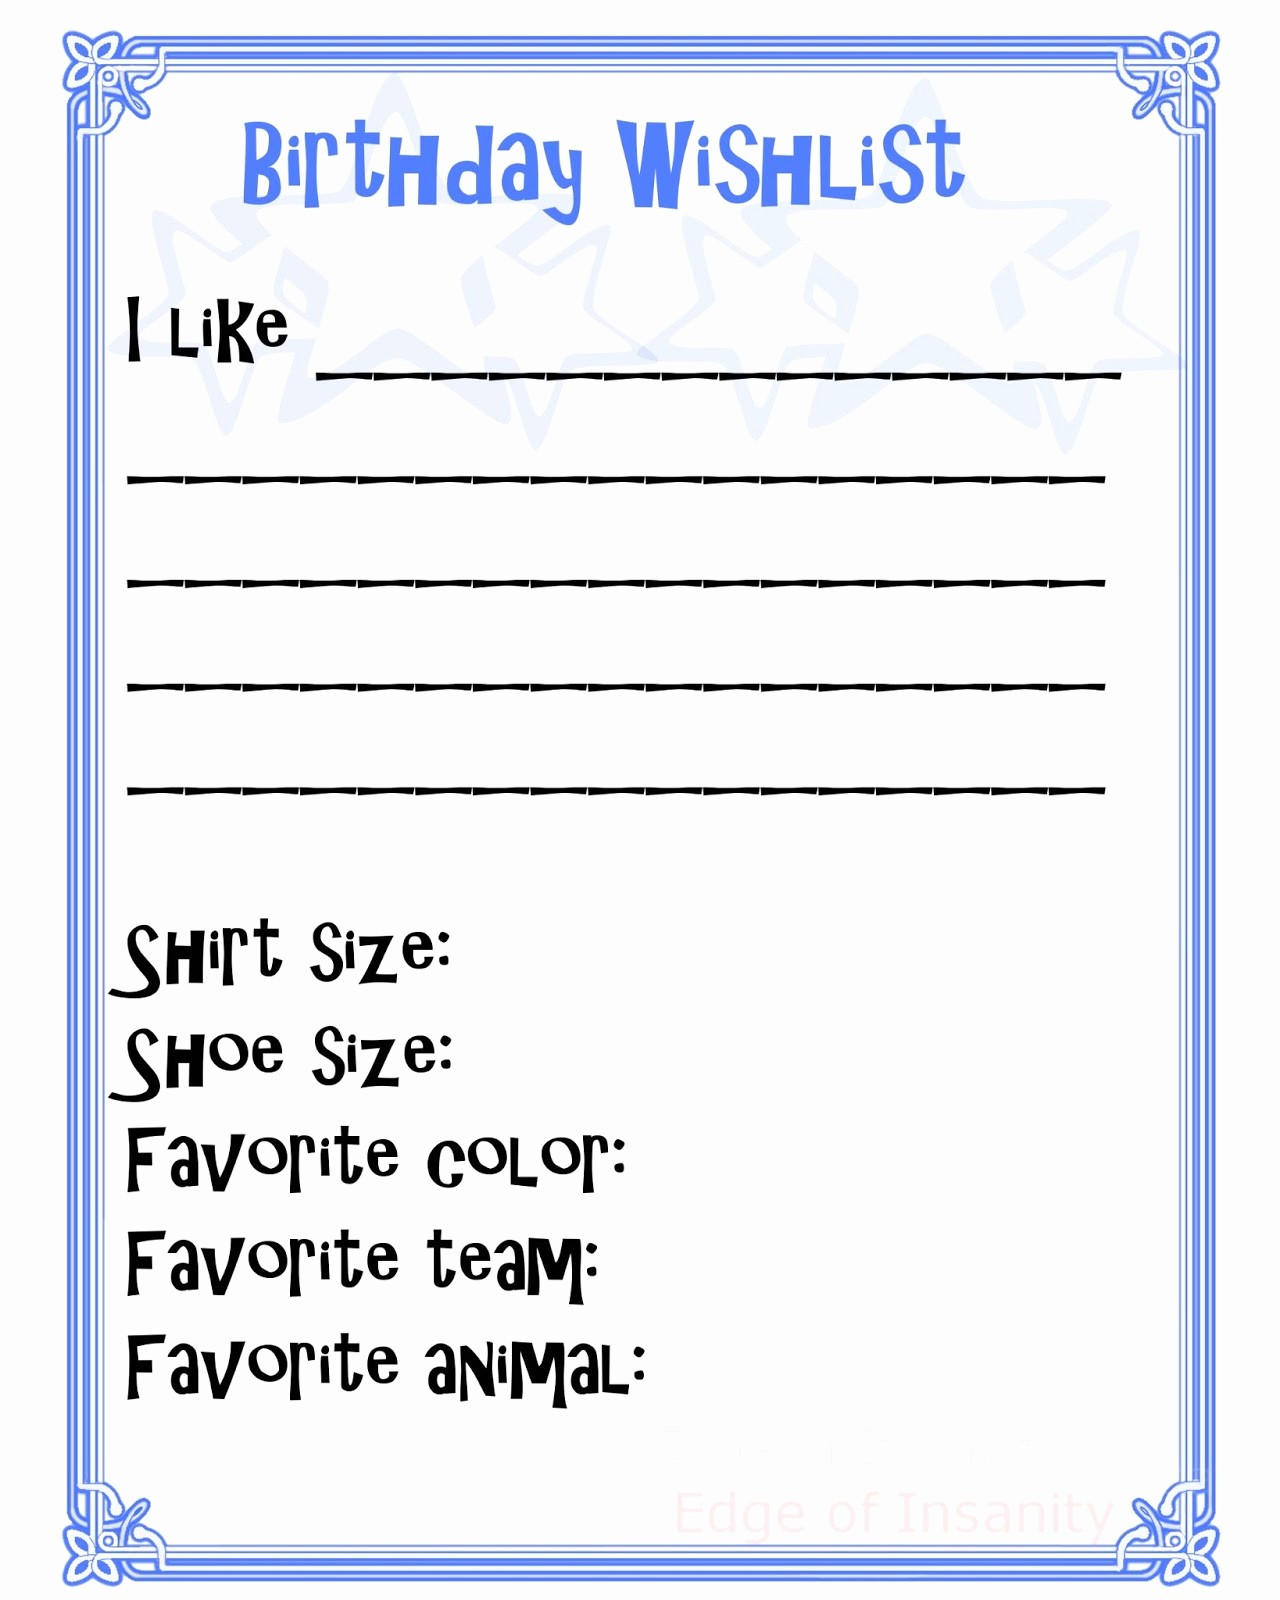 Birthday Wish List Template Printable Fresh 6 Best Of Wish List Printable Free Printable